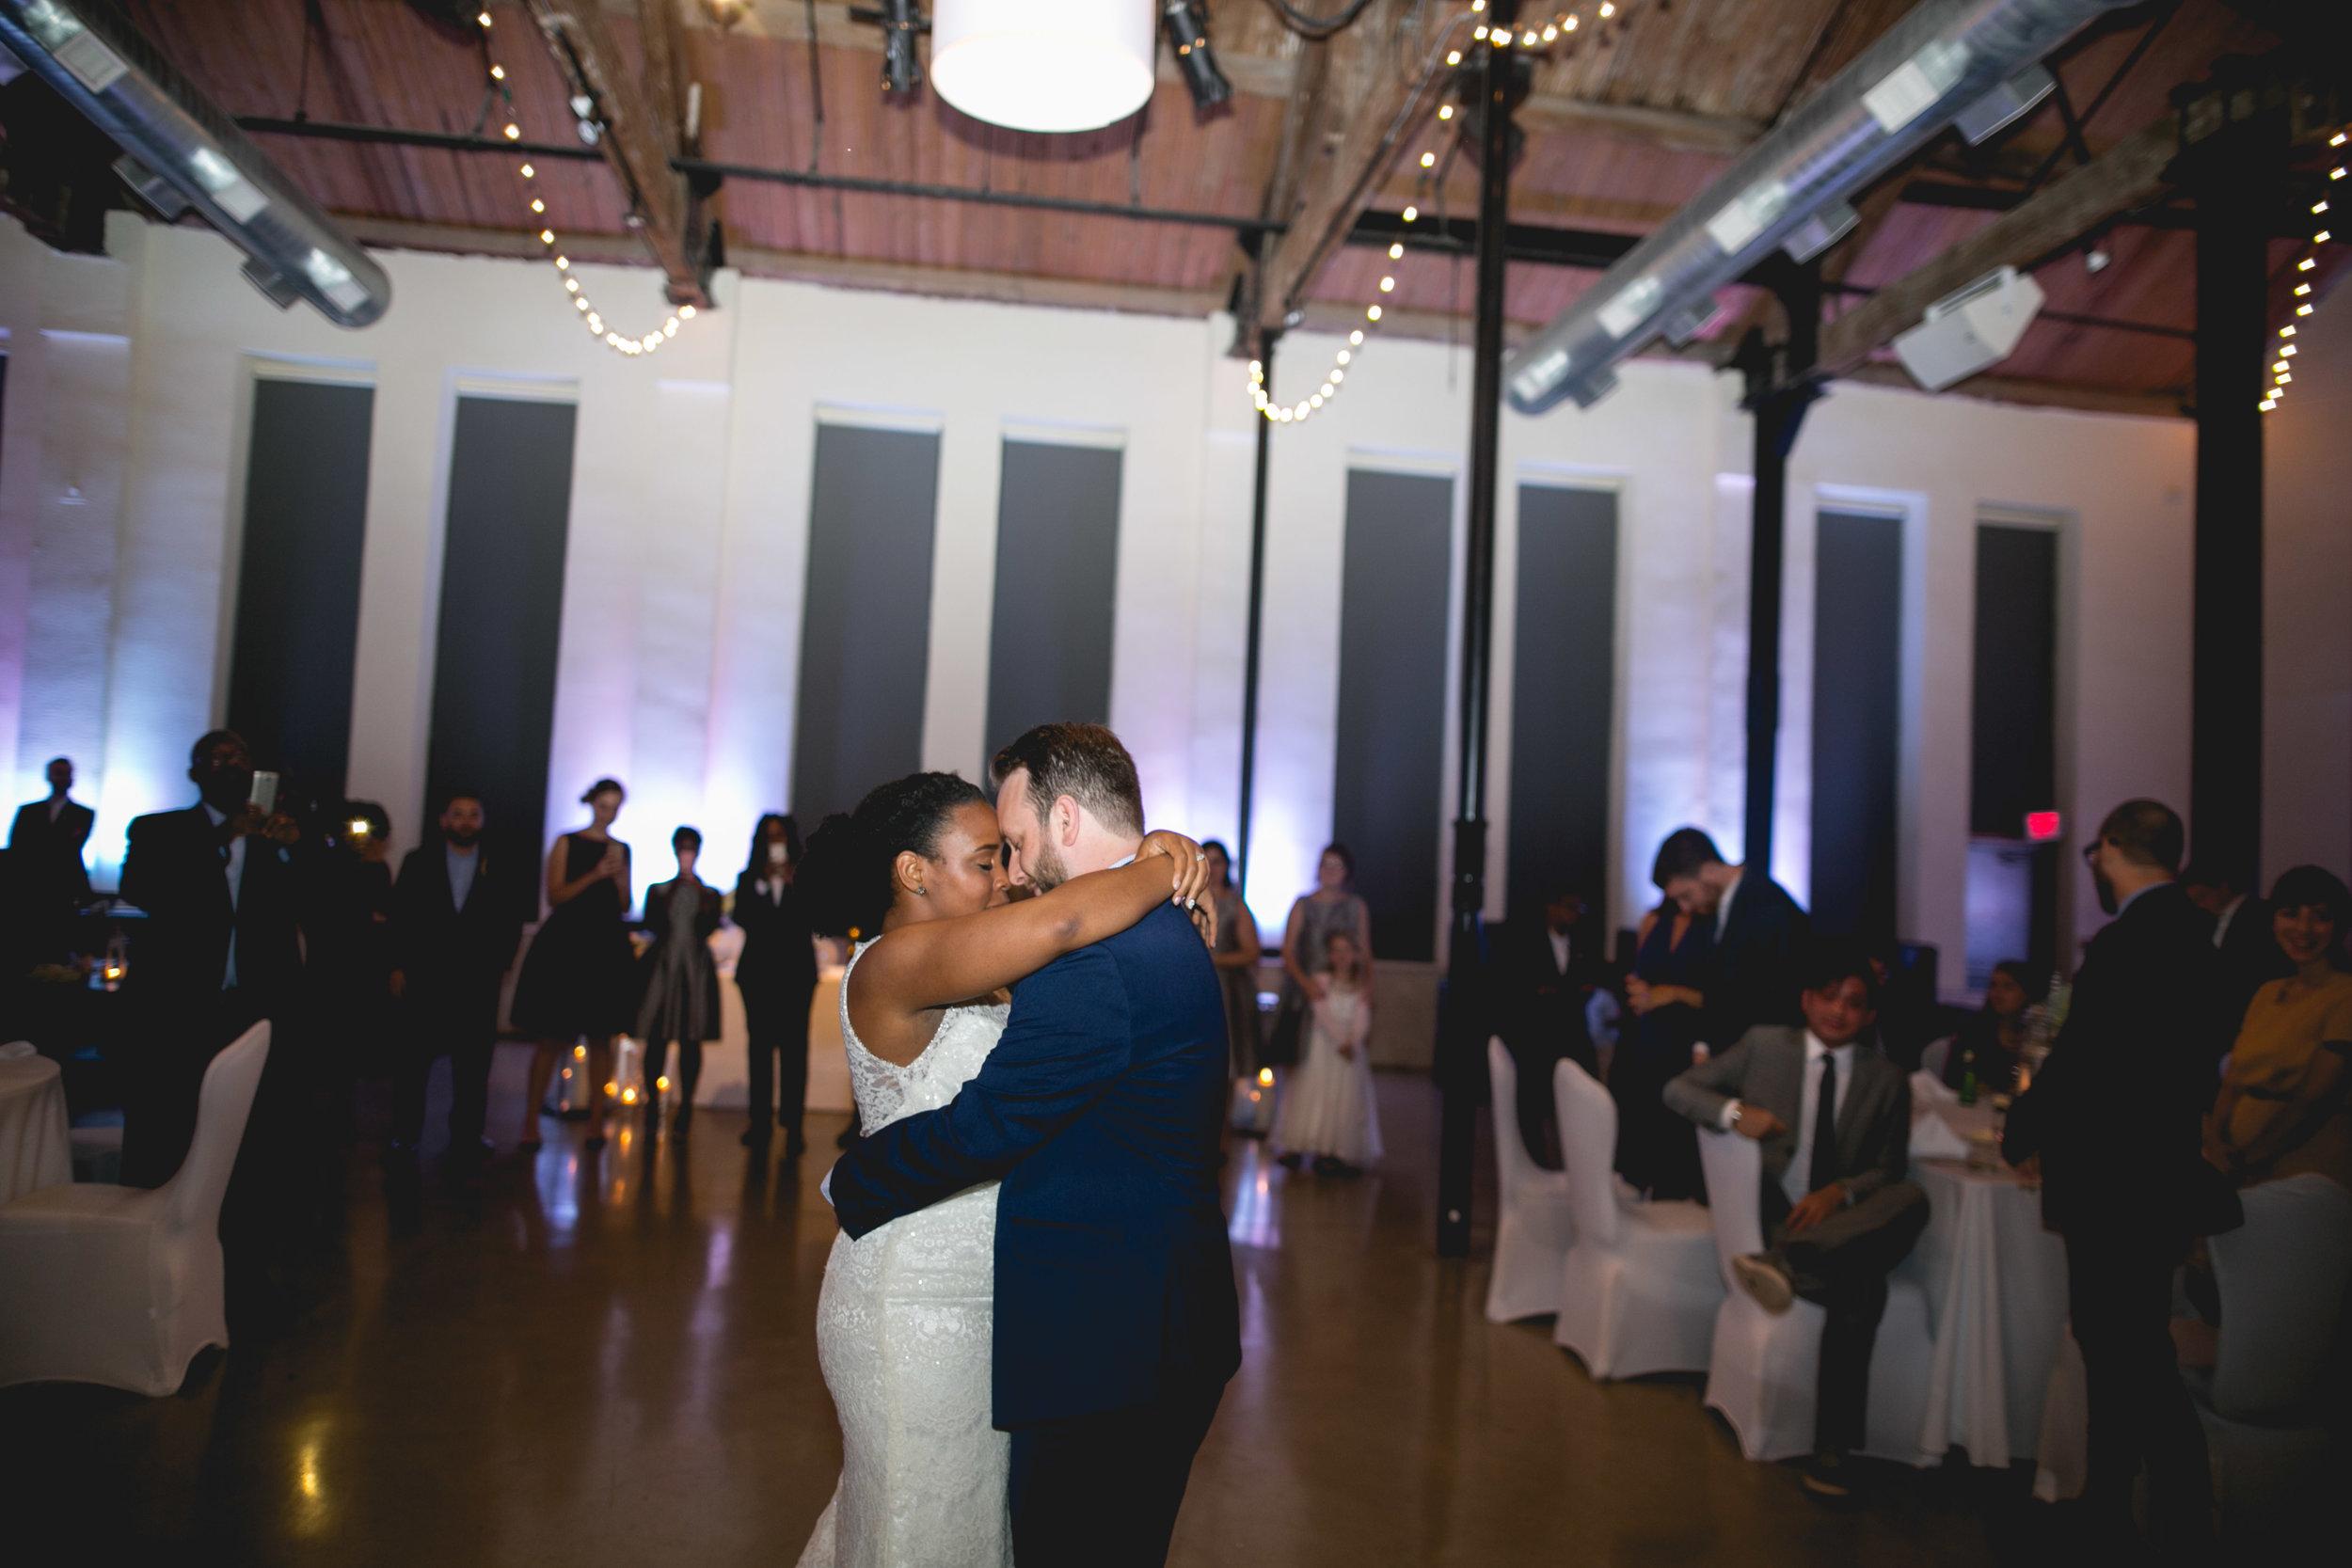 A Philadelphia Fishtown Skybox Wedding by Lesbian Photographer Swiger Photographer. Monet and Daniel - an industrial fall Philly Wedding